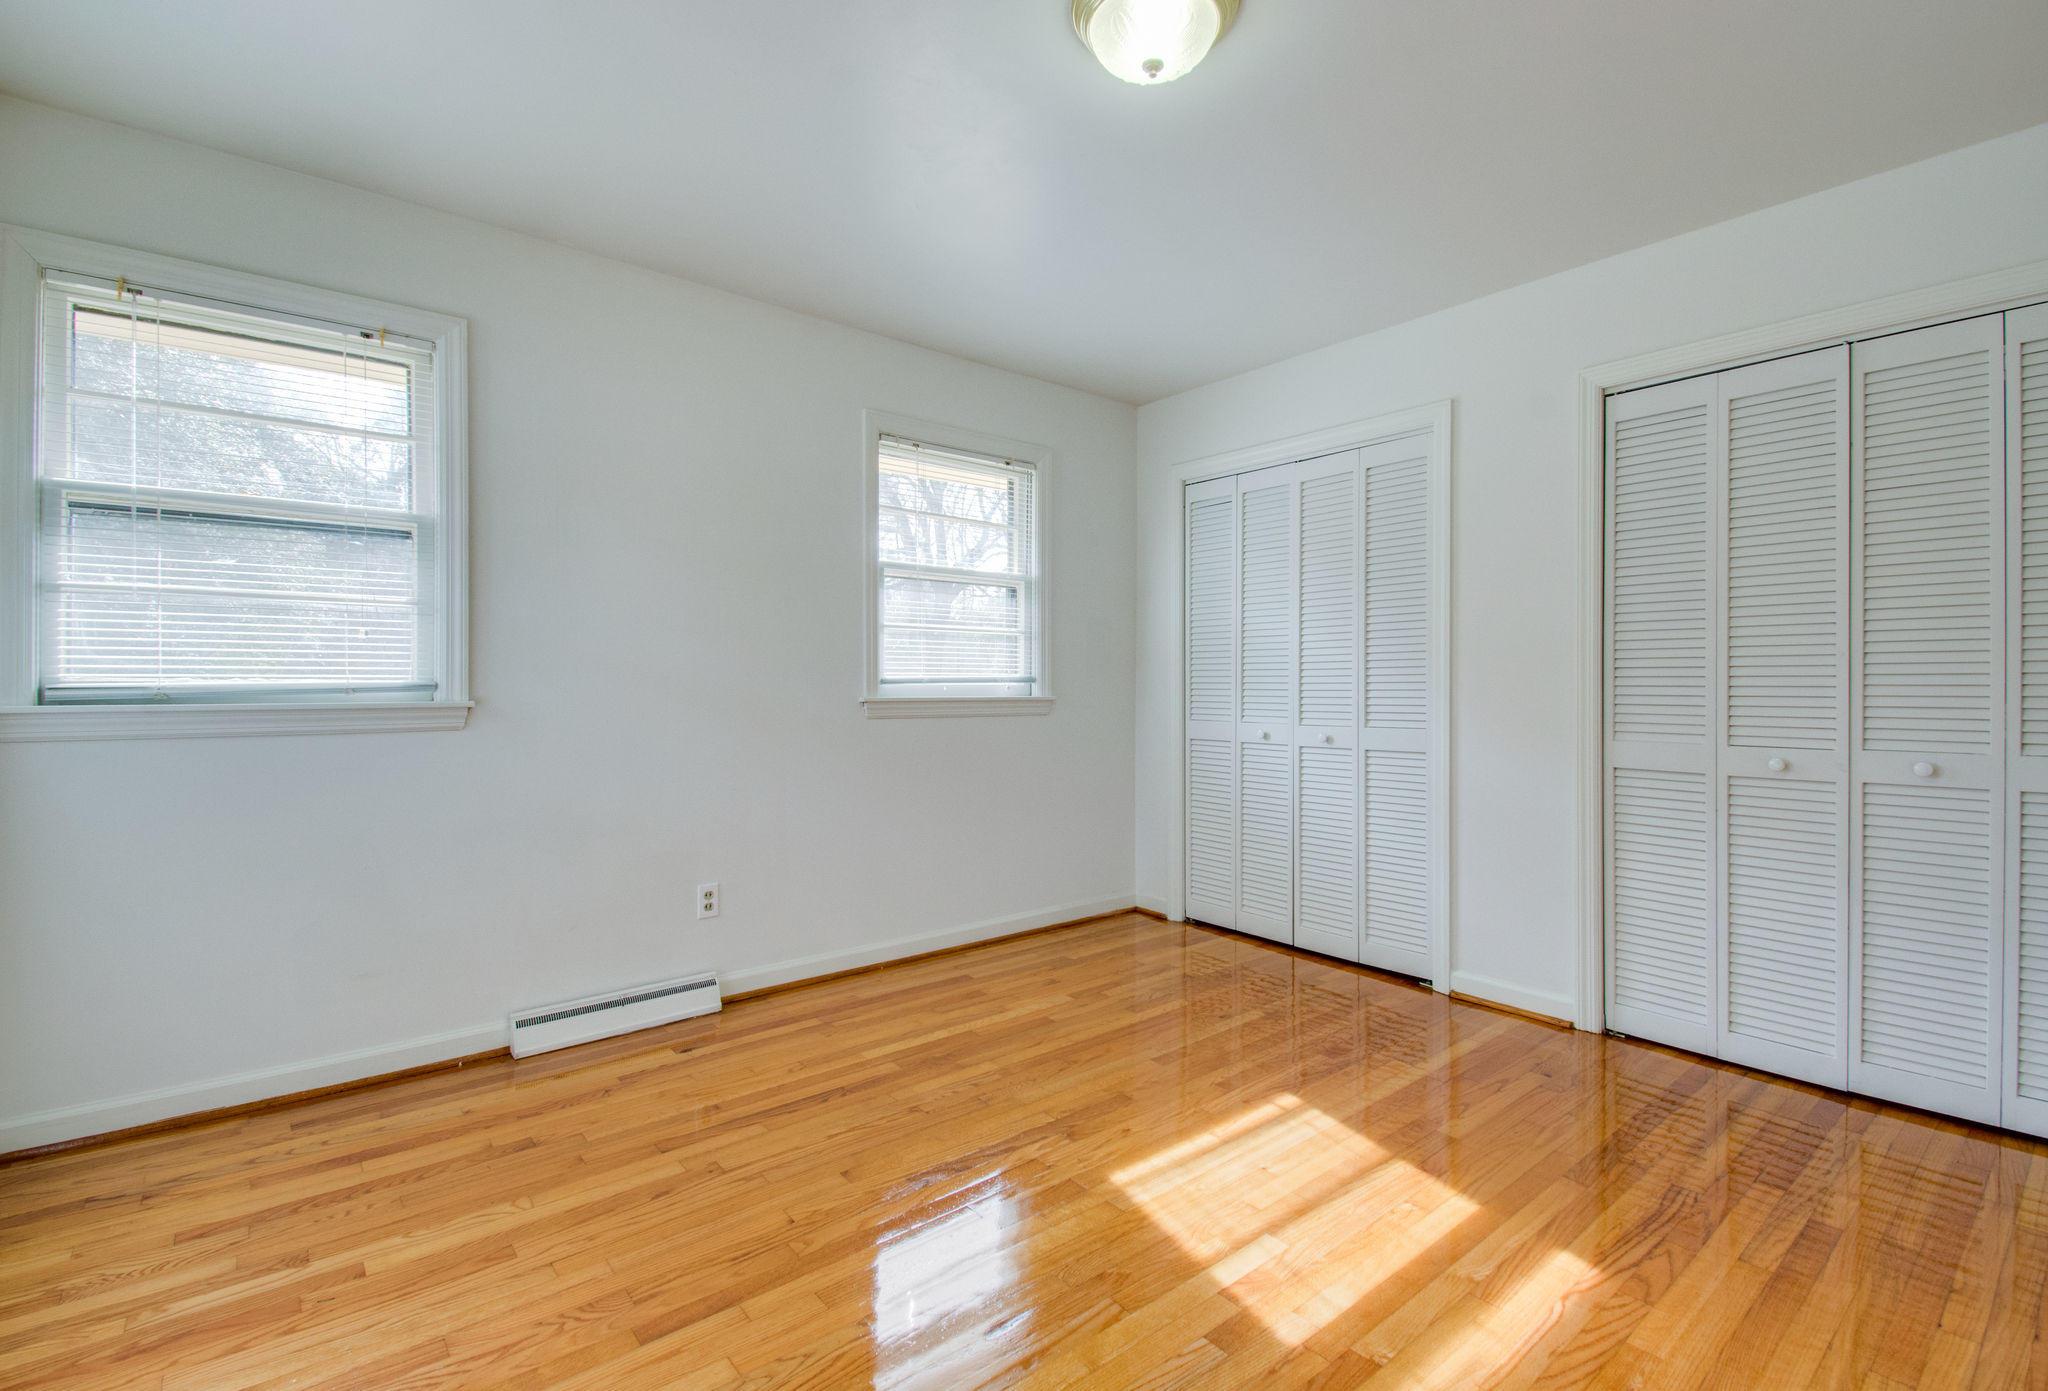 Northbridge Terrace Homes For Sale - 1114 Northbridge, Charleston, SC - 10